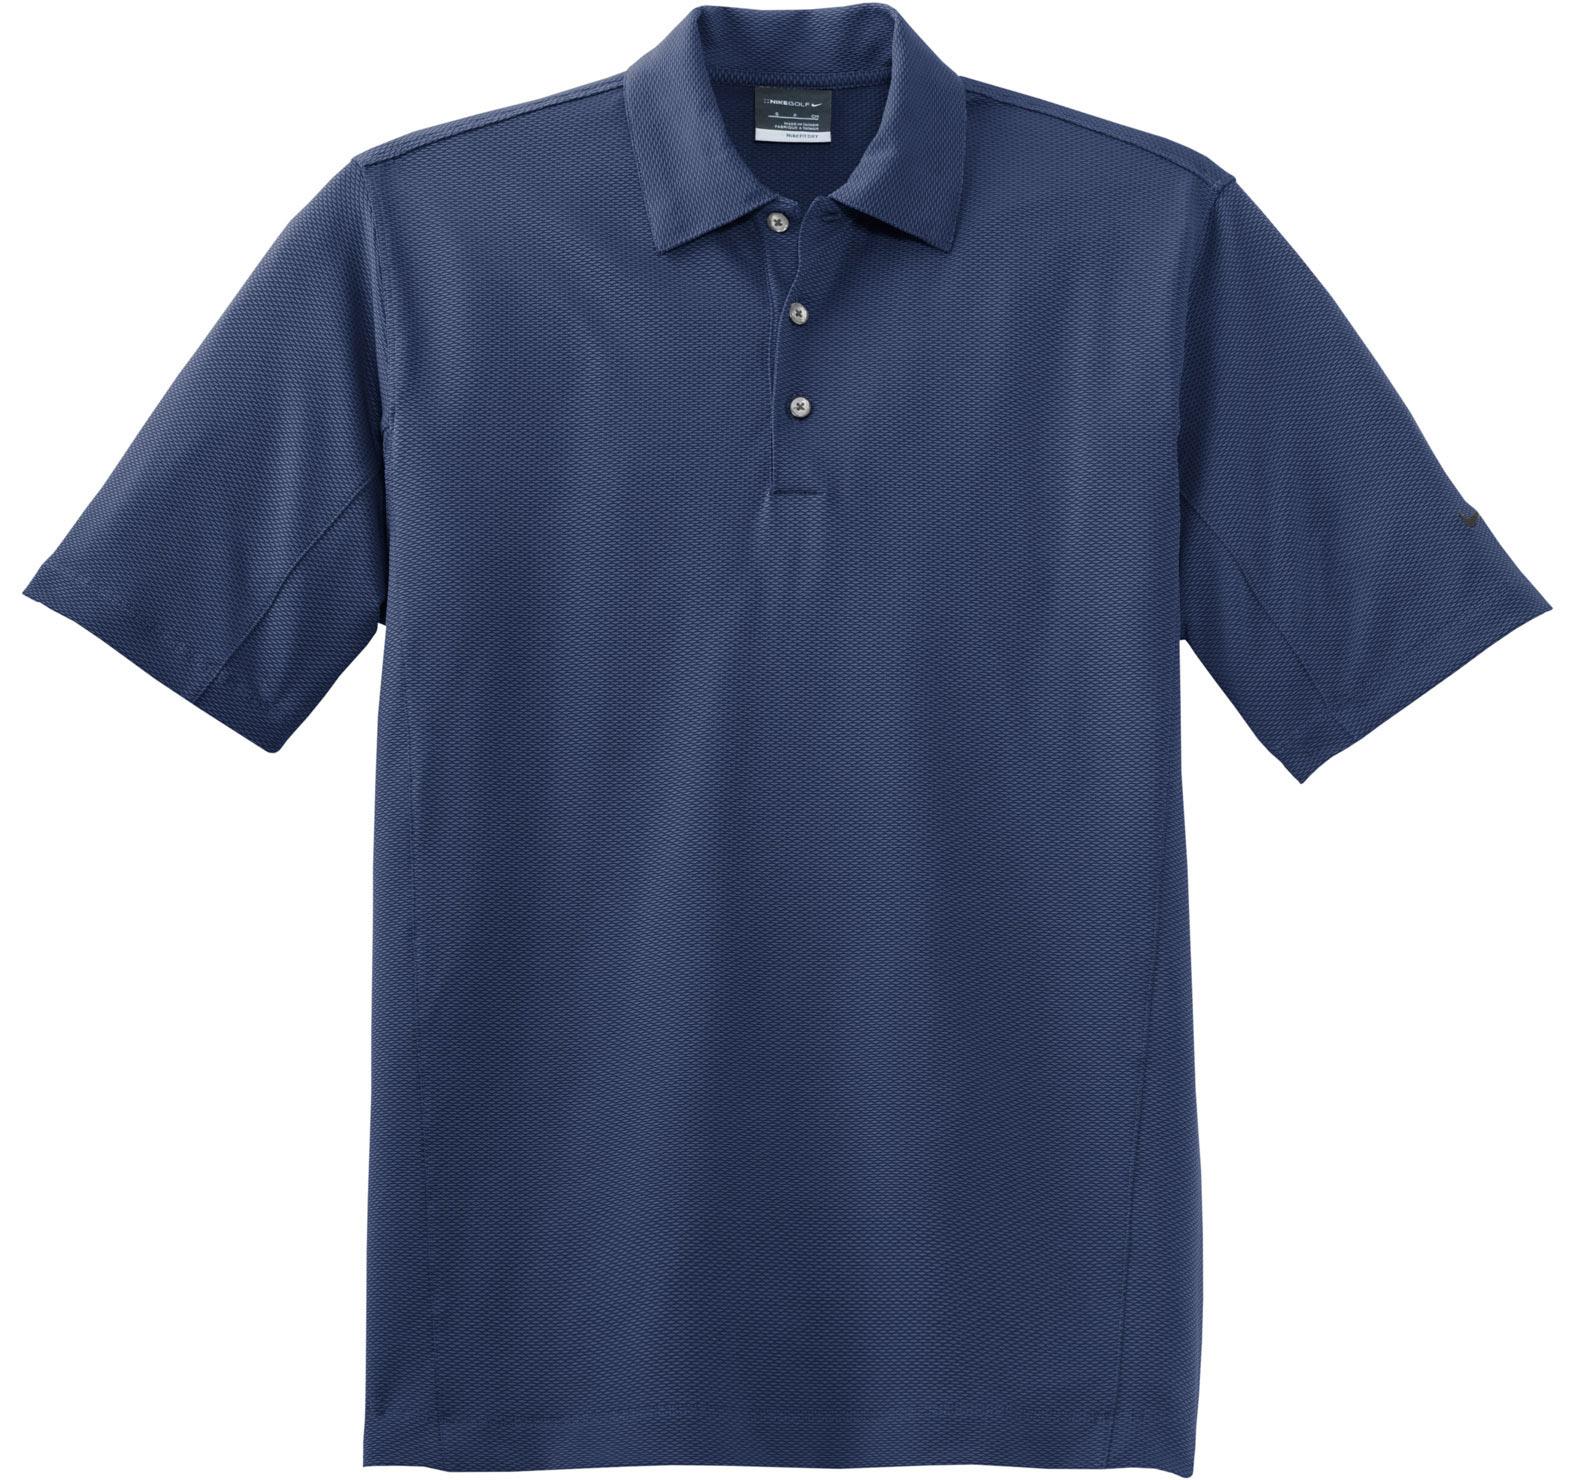 Sports jersey clip art clipart best for Custom nike golf shirts